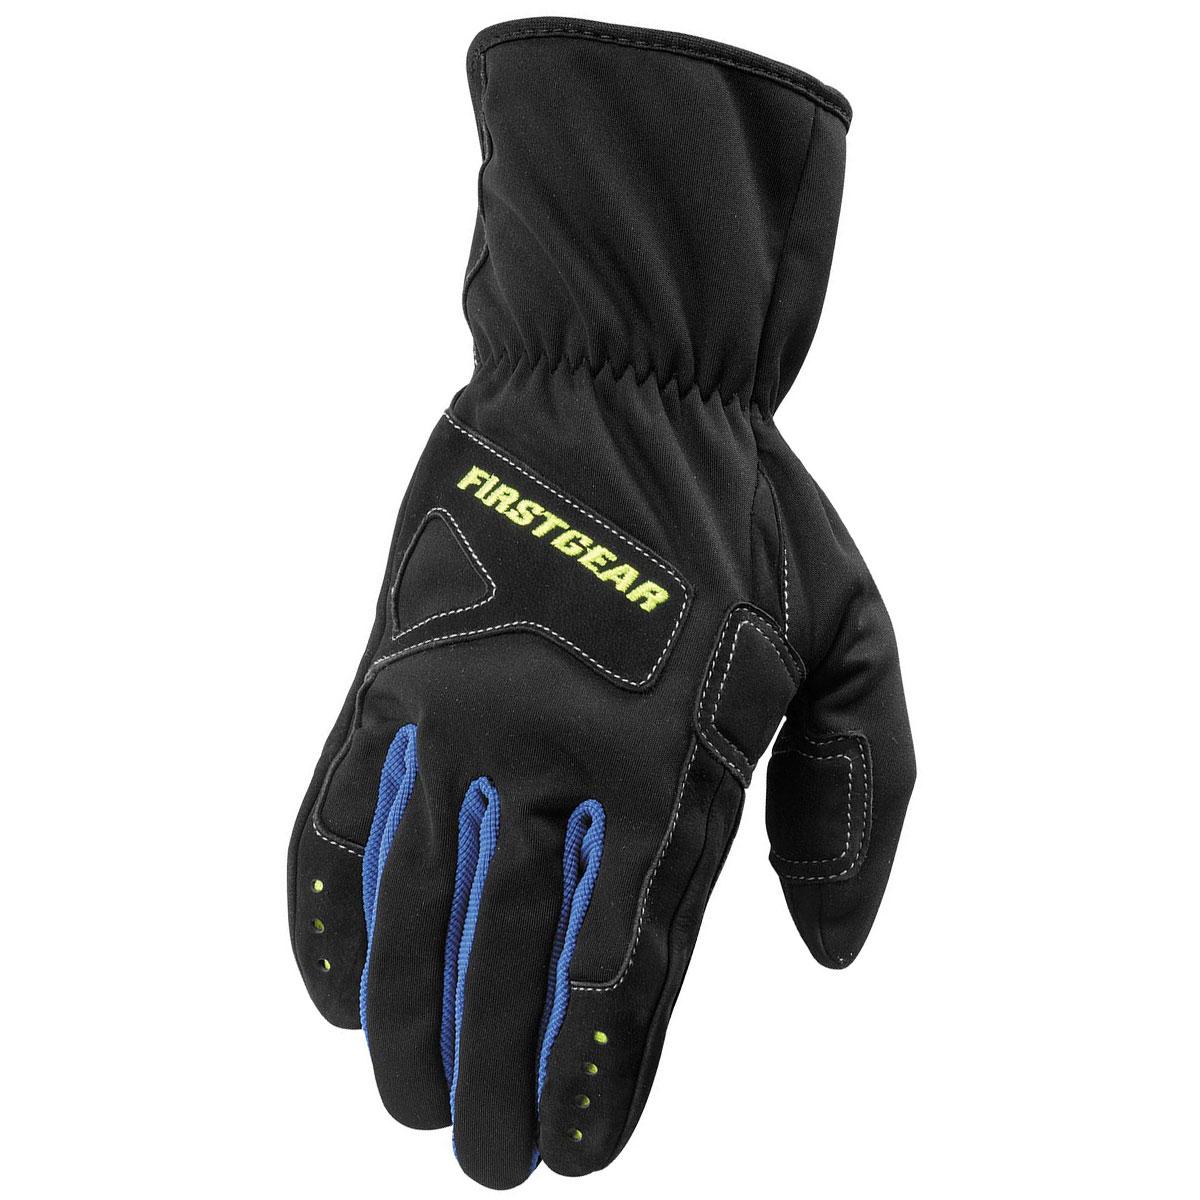 Firstgear Swagman Windproof Gloves